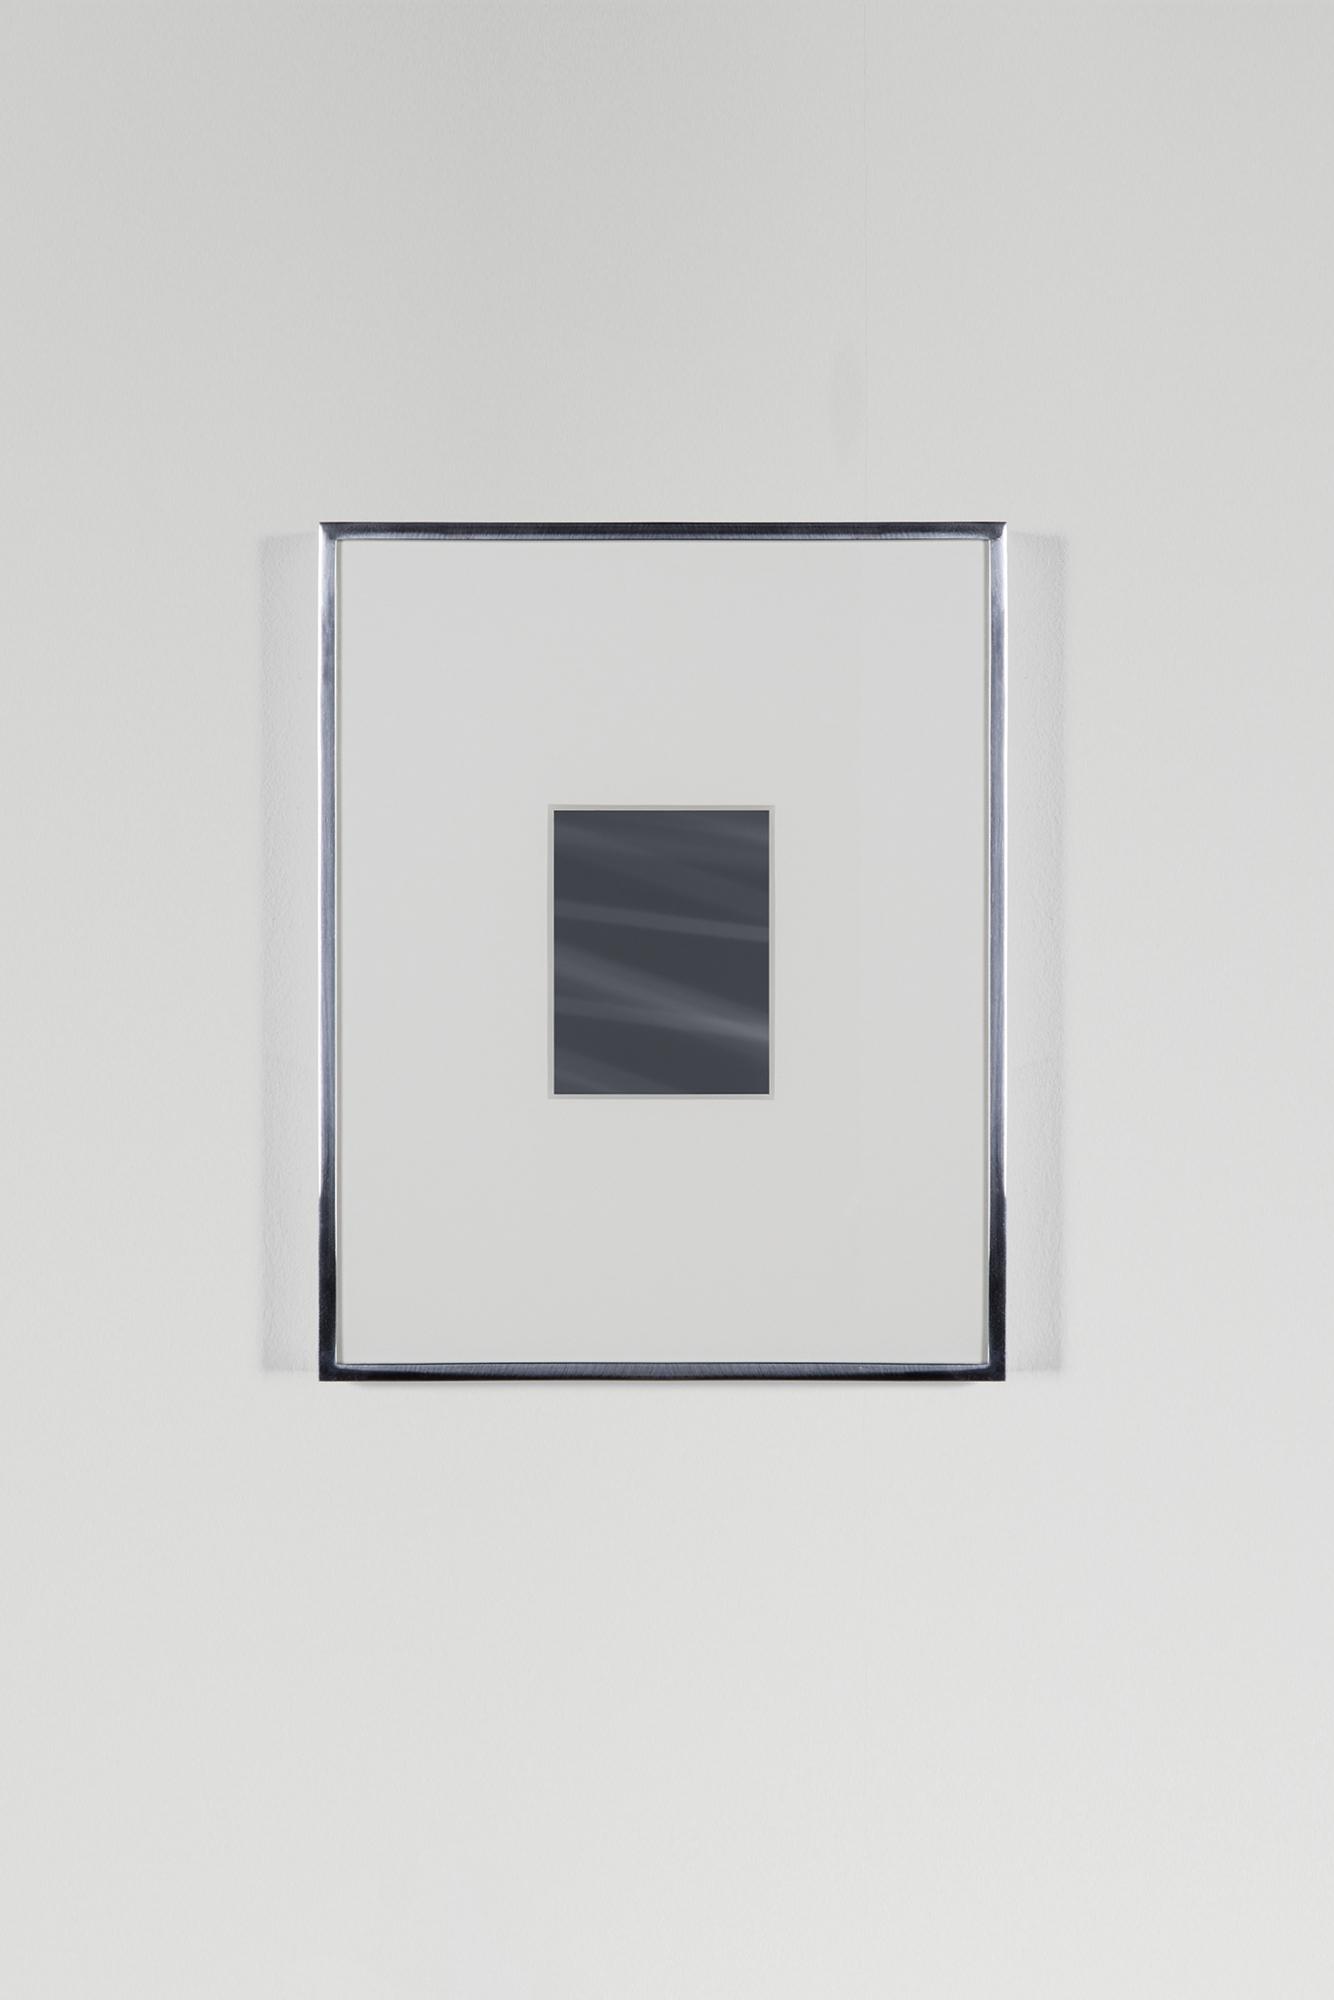 Transparency (Negative) [Kodak Portra 400NC Em. No. 1022: April 10–May 11, 2015 LAX/EWR/MXP FCO/EWR/LAX]    2017   Epson Ultrachrome K3 archival ink jet print on Museo Silver Rag Paper  14 x 11 inches   Transparencies, 2014–